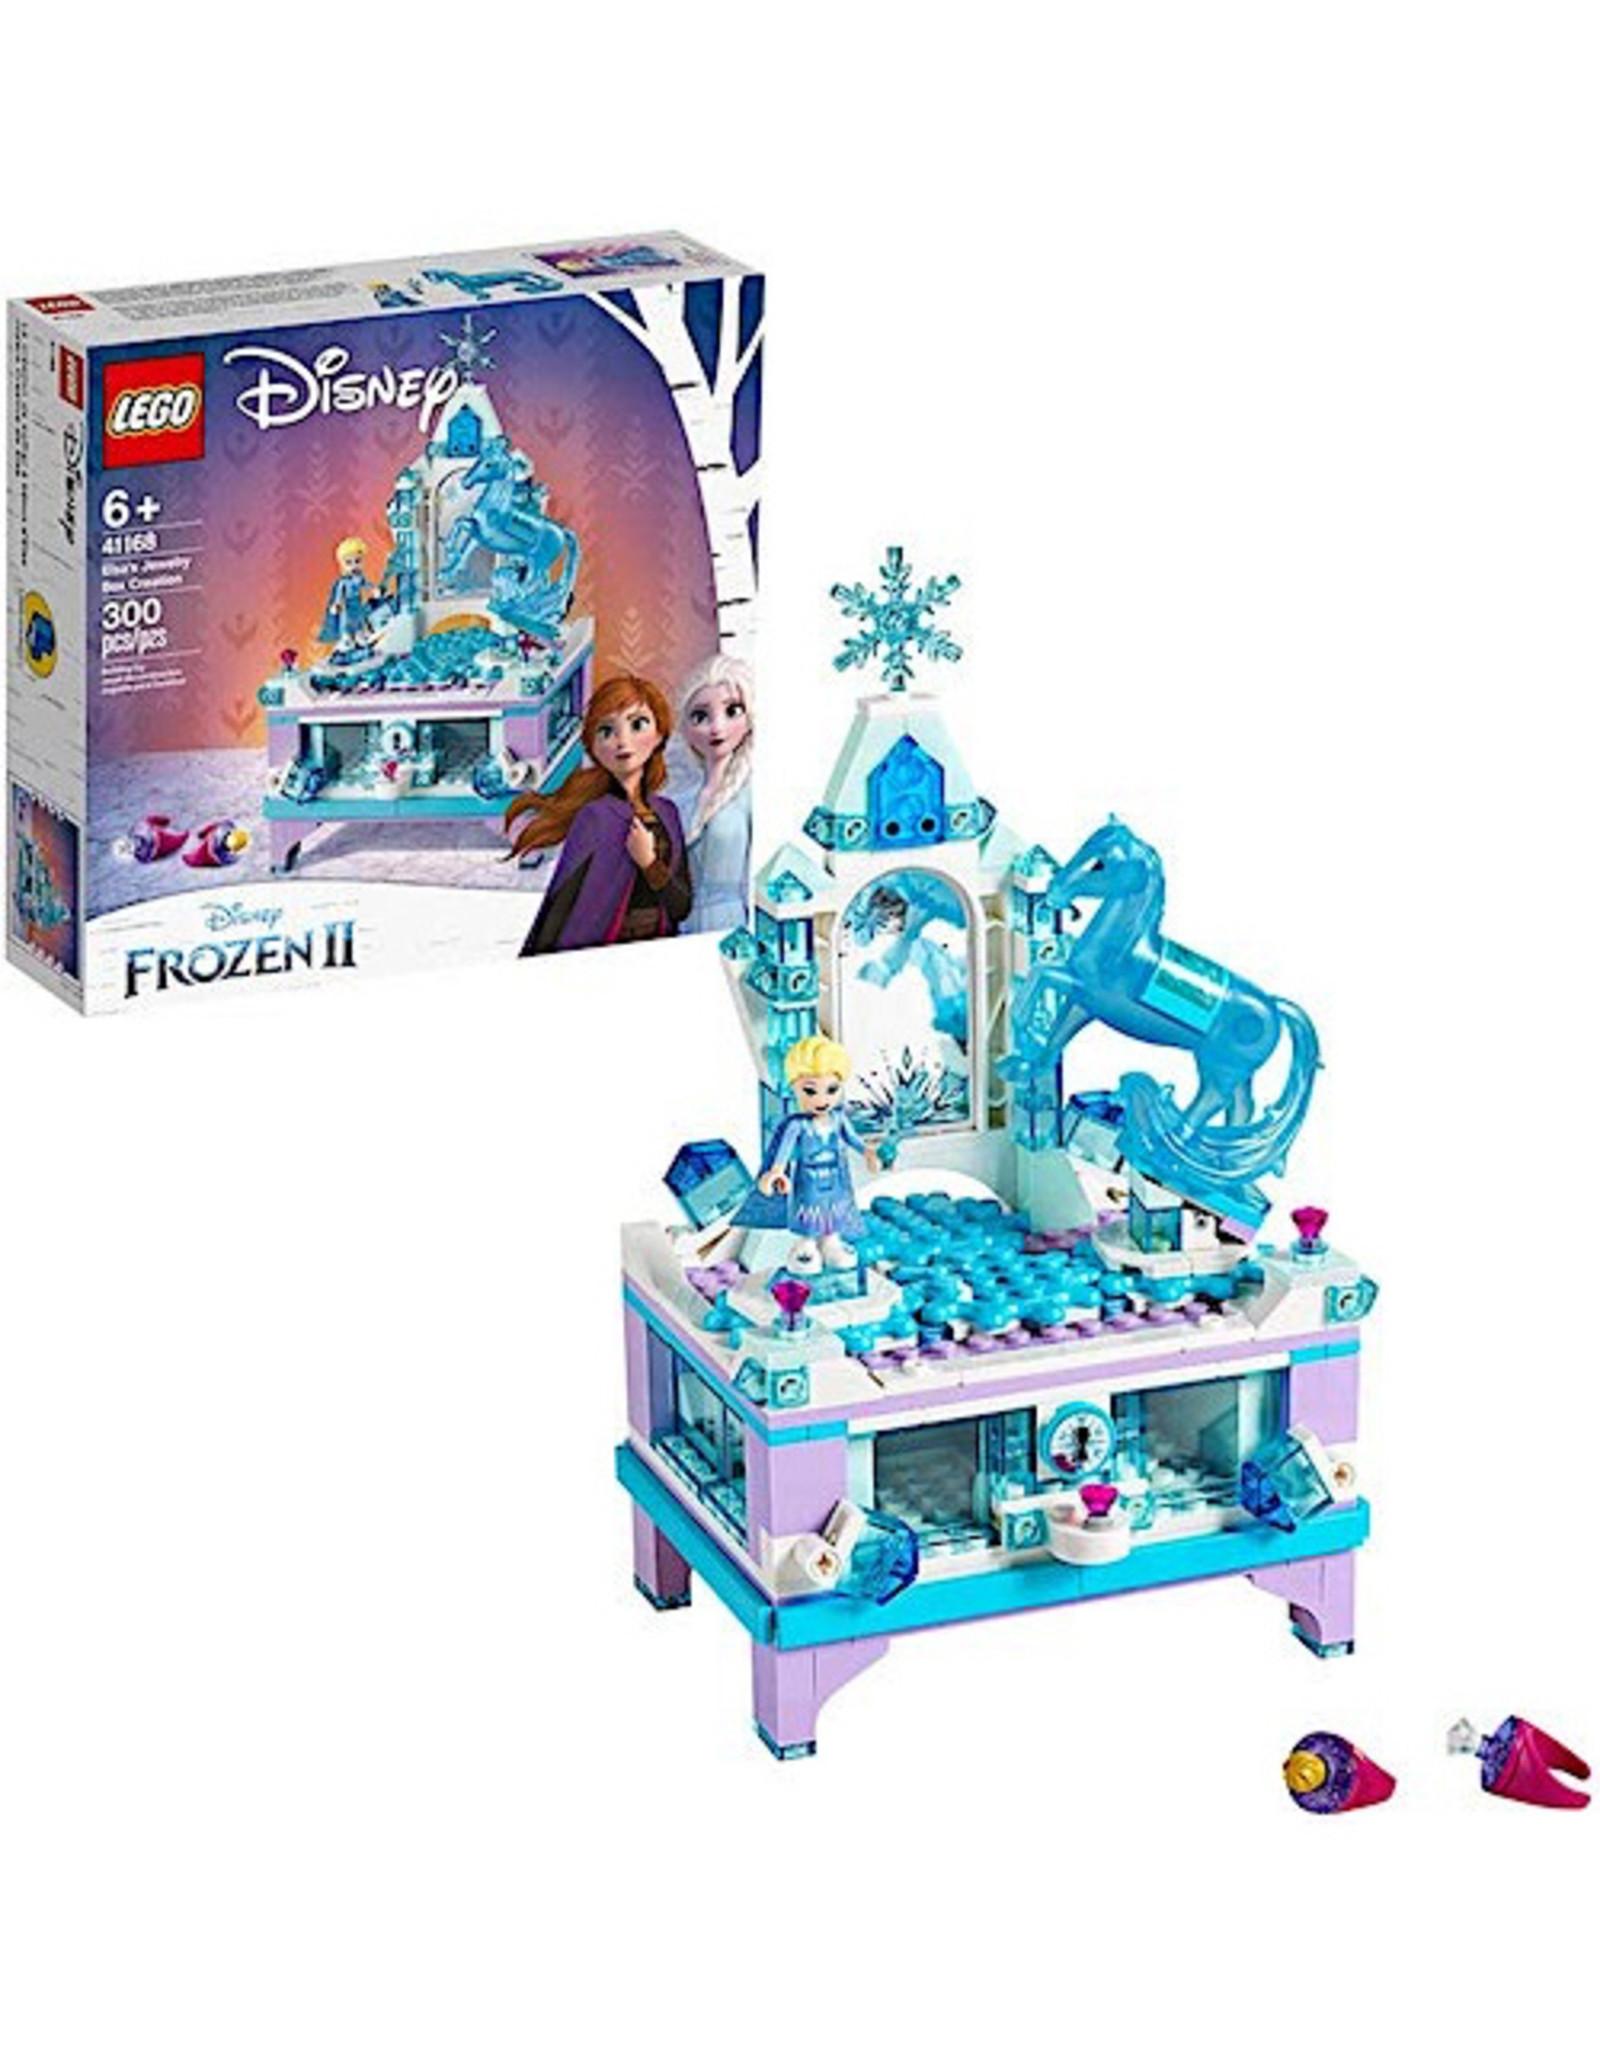 Lego Elsa's Jewlery Box Creation